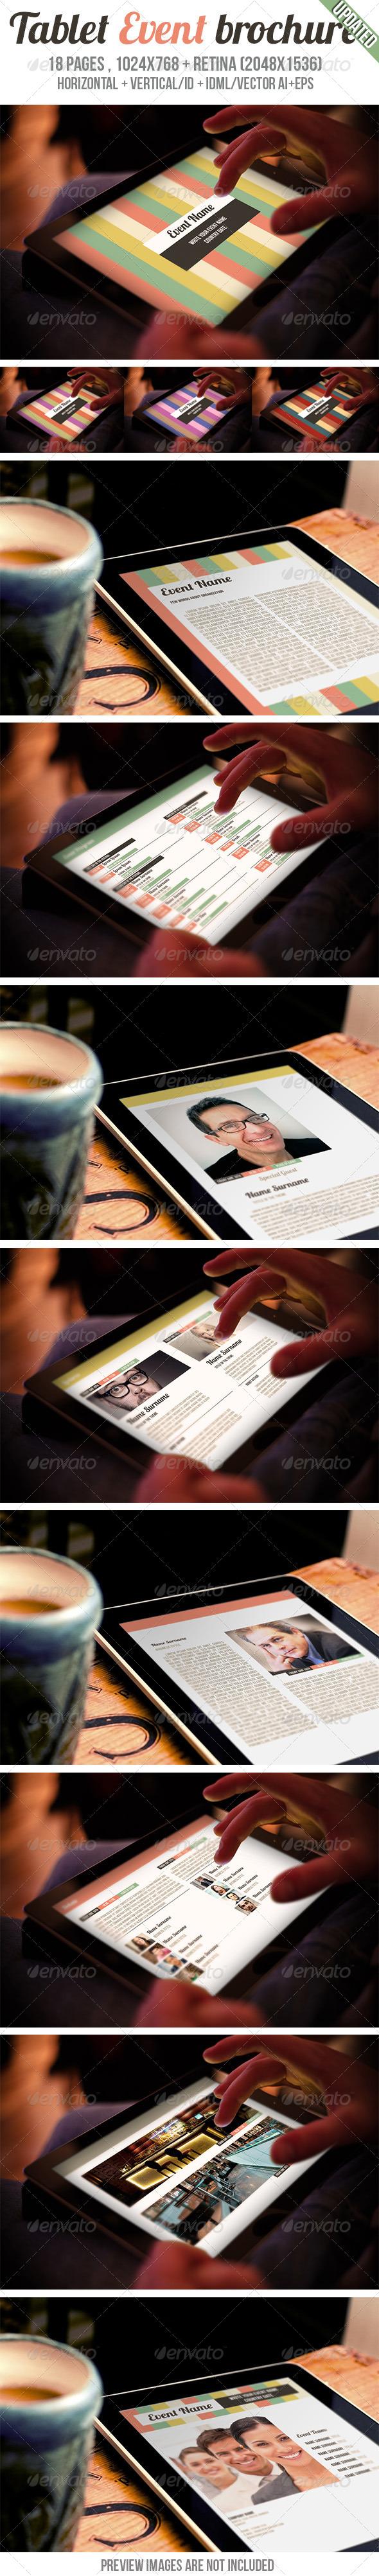 iPad & Tablet Event Brochure - Digital Magazines ePublishing